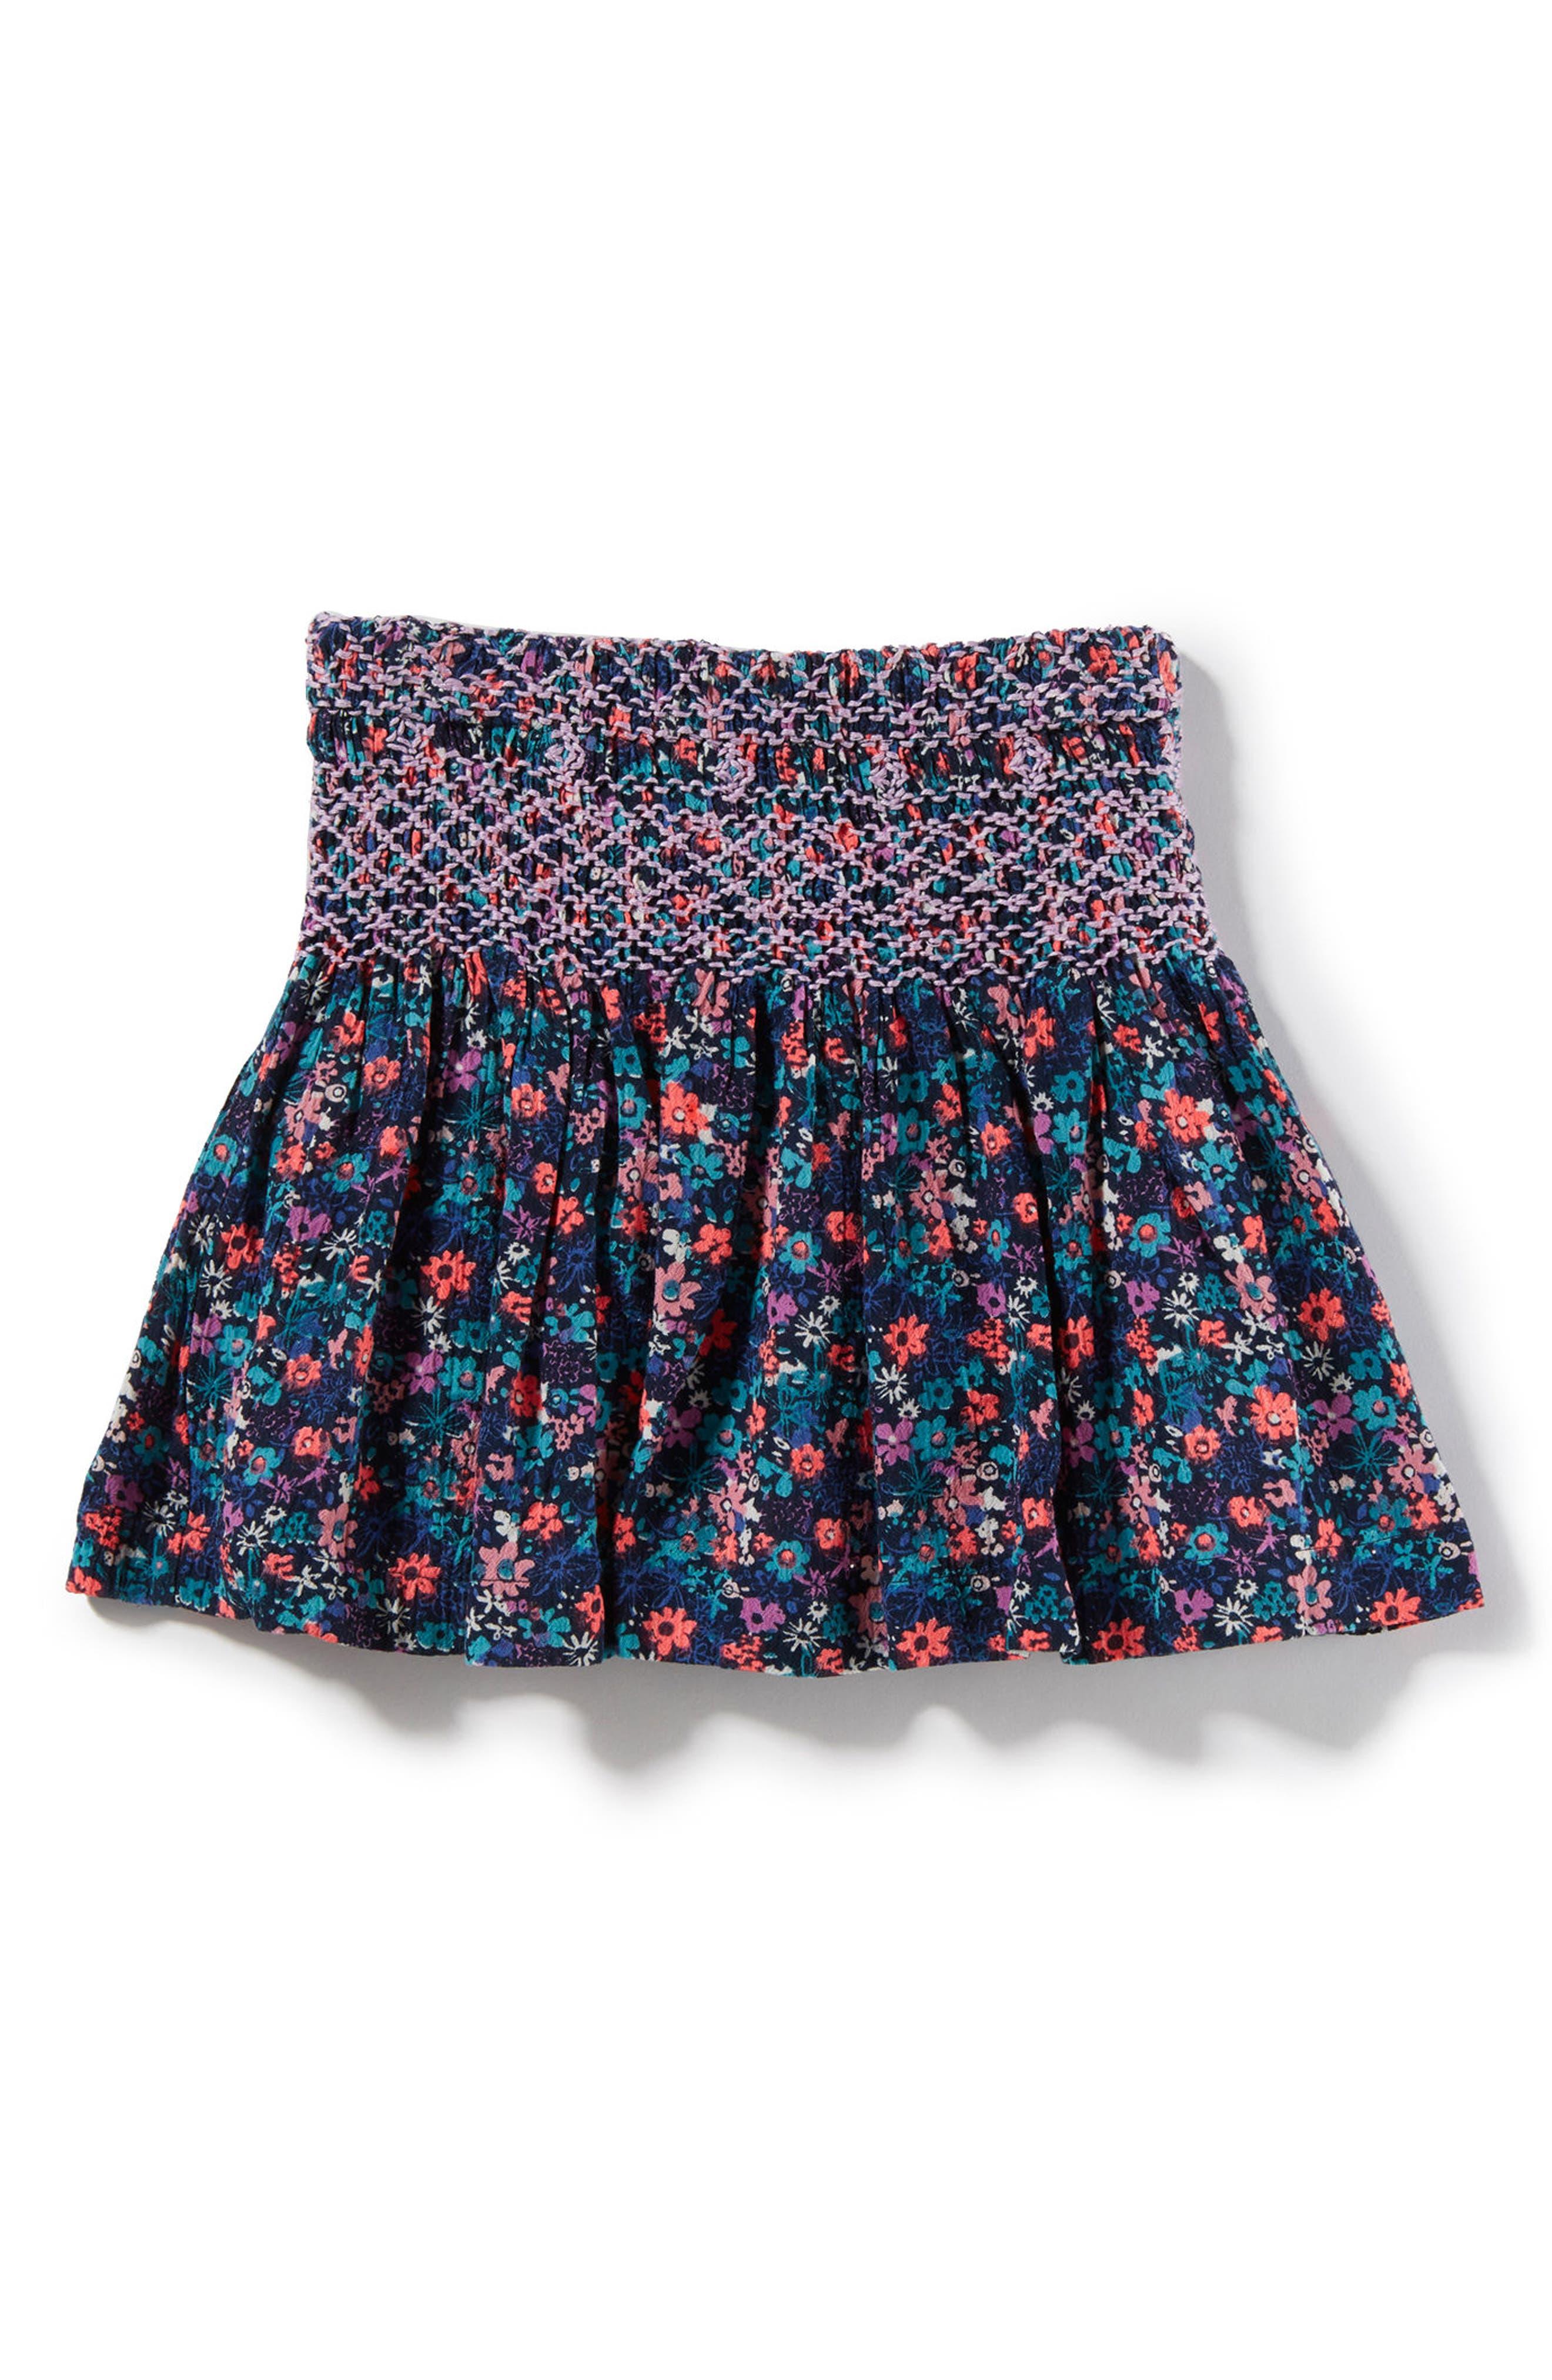 Pixie Smock Skirt,                             Main thumbnail 1, color,                             410